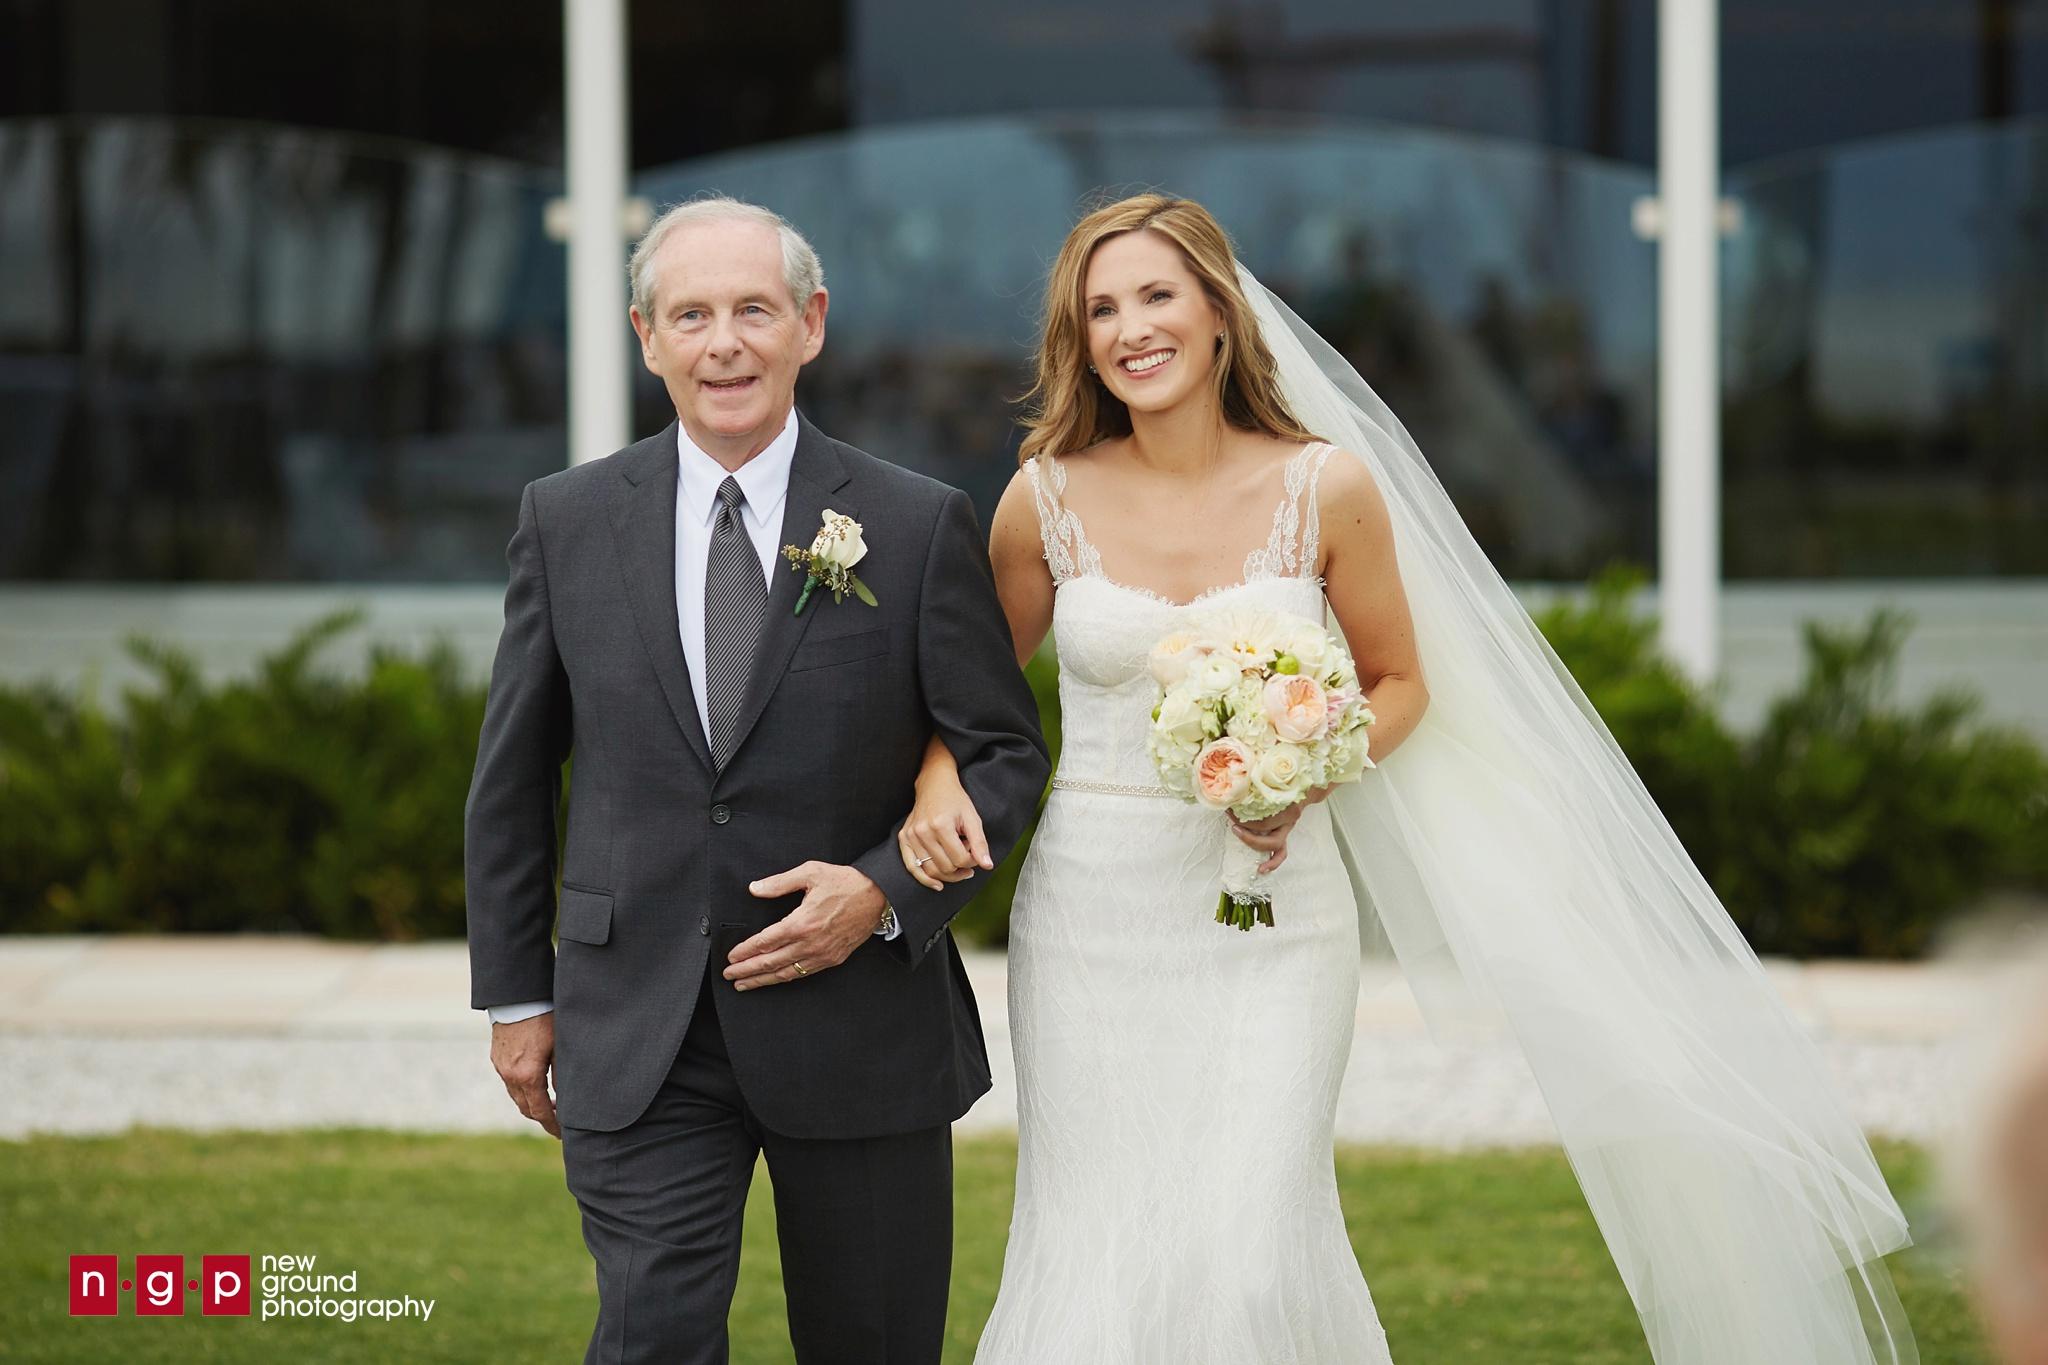 Naples Florida Beach Weddings: Naples Beach Hotel Wedding